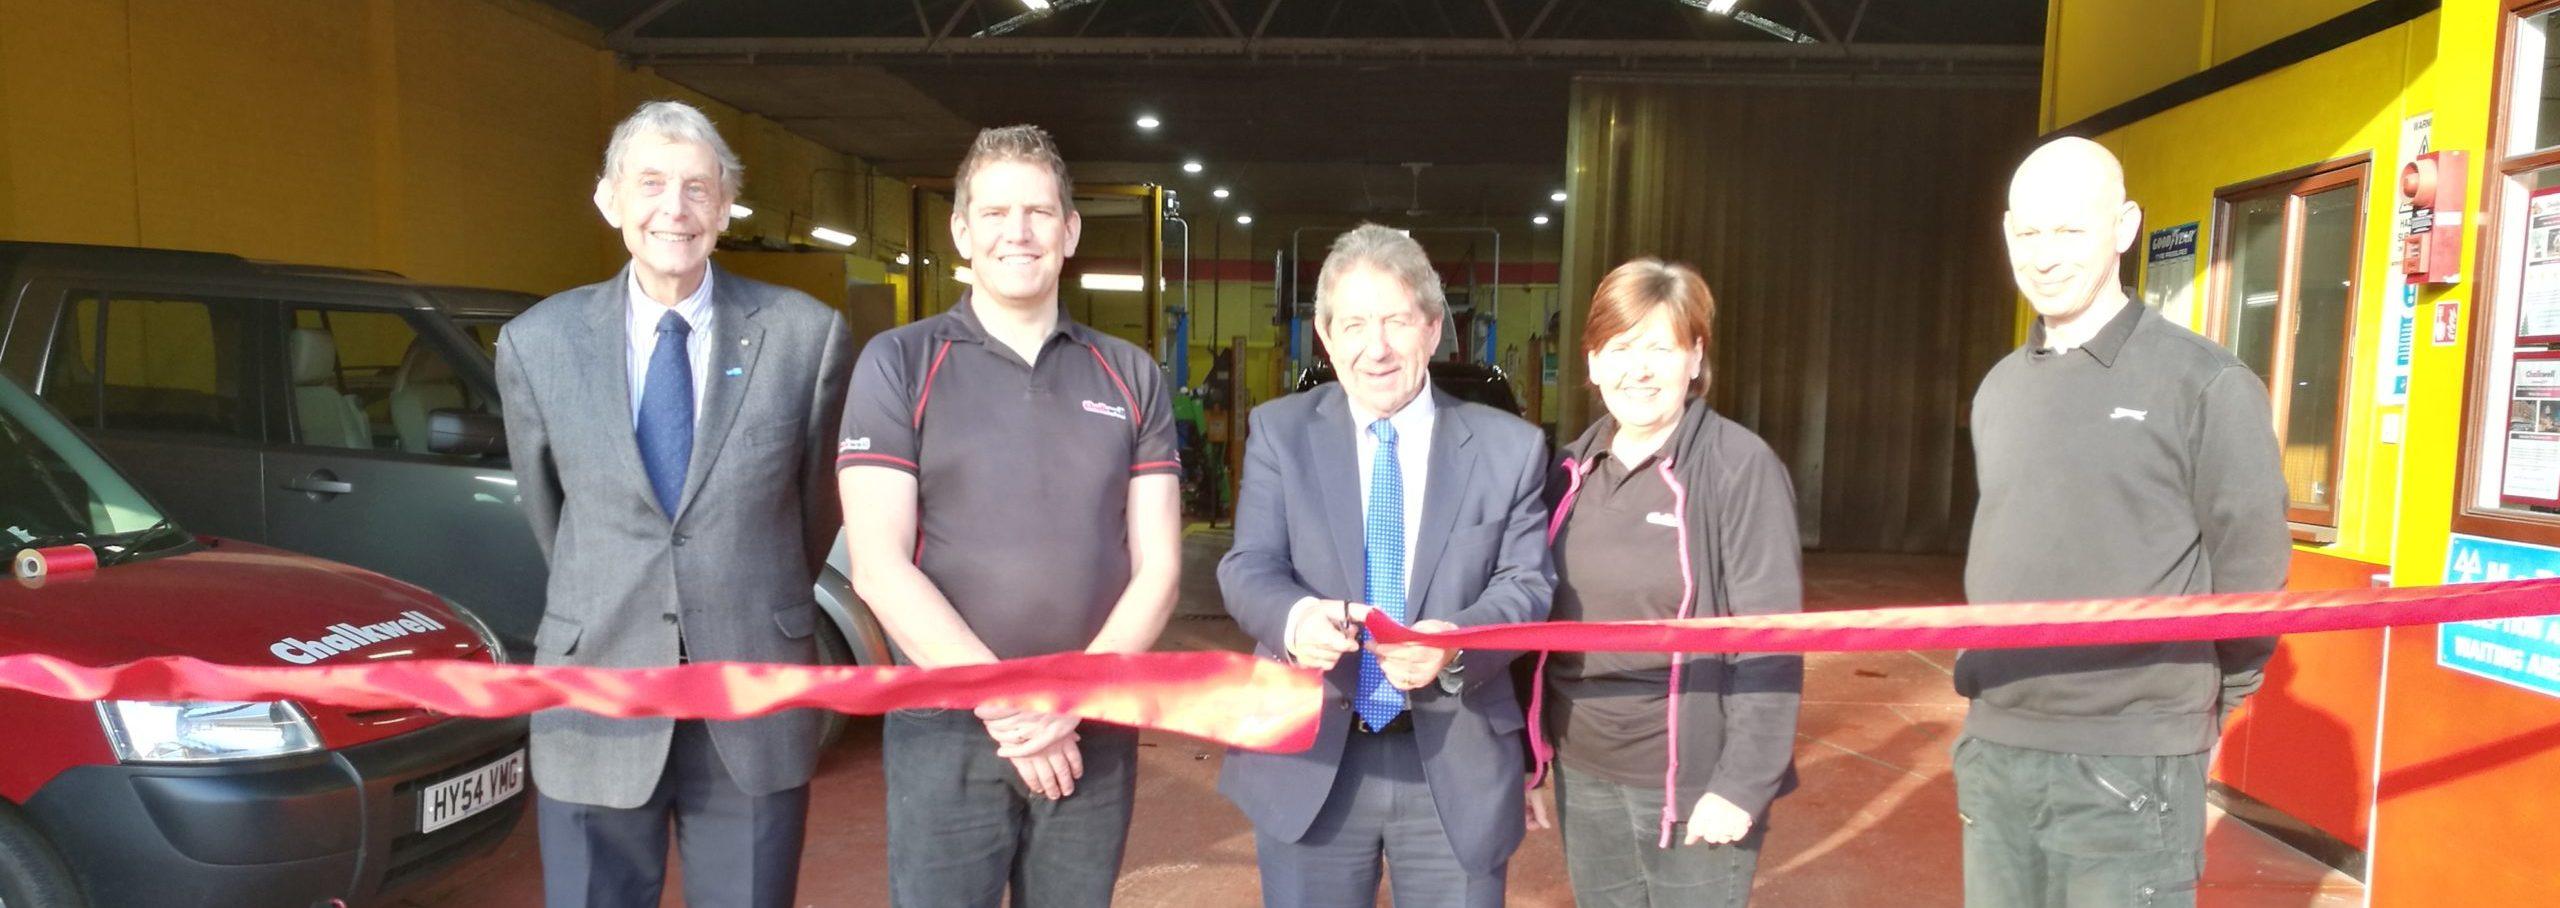 Gordon Henderson MP Relaunches Chalkwell Garage